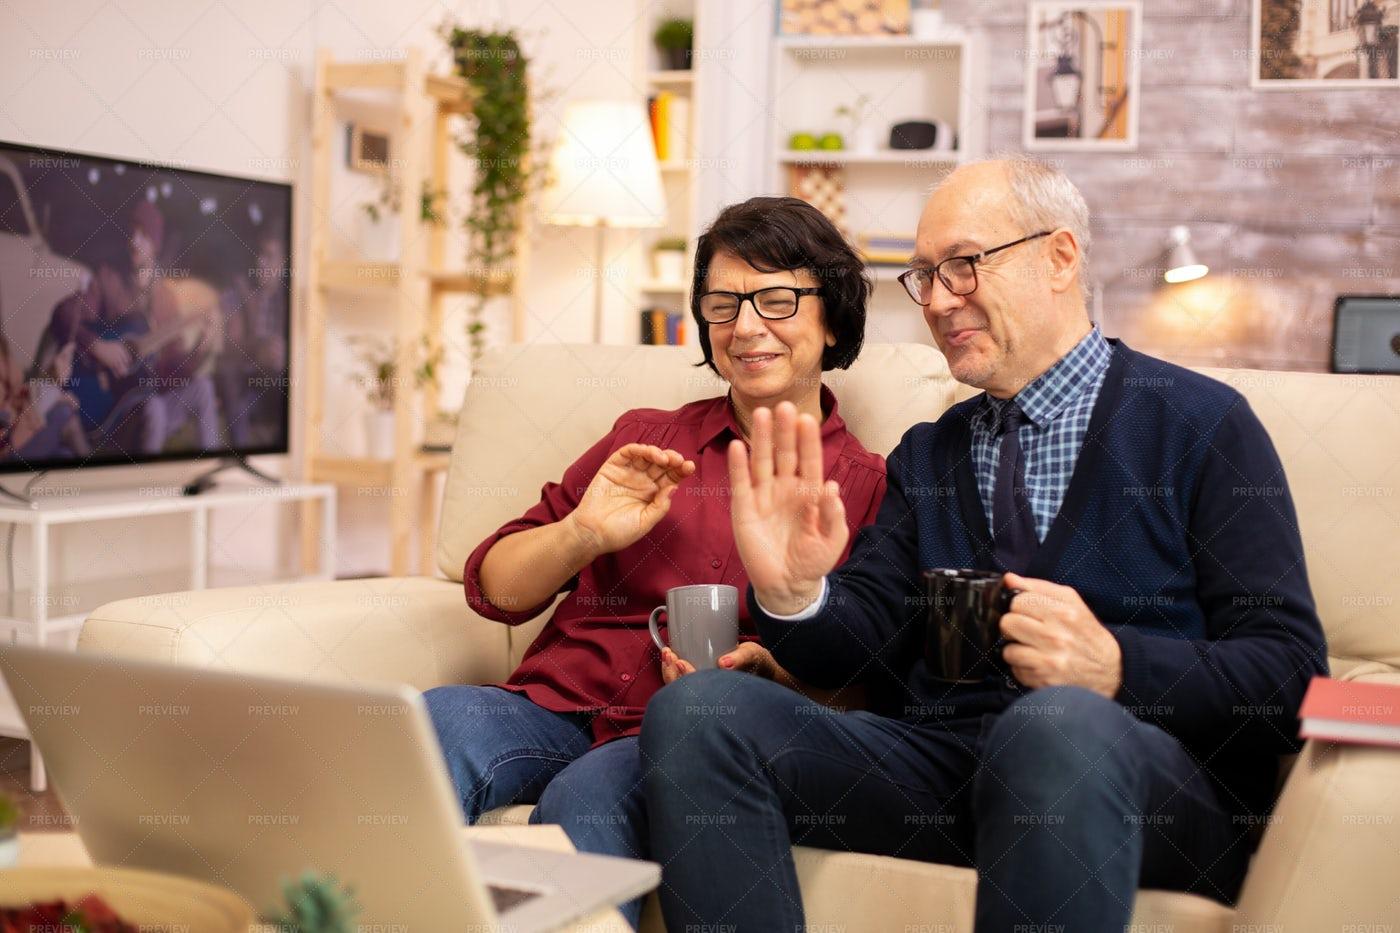 Couple Waving On Video Call: Stock Photos